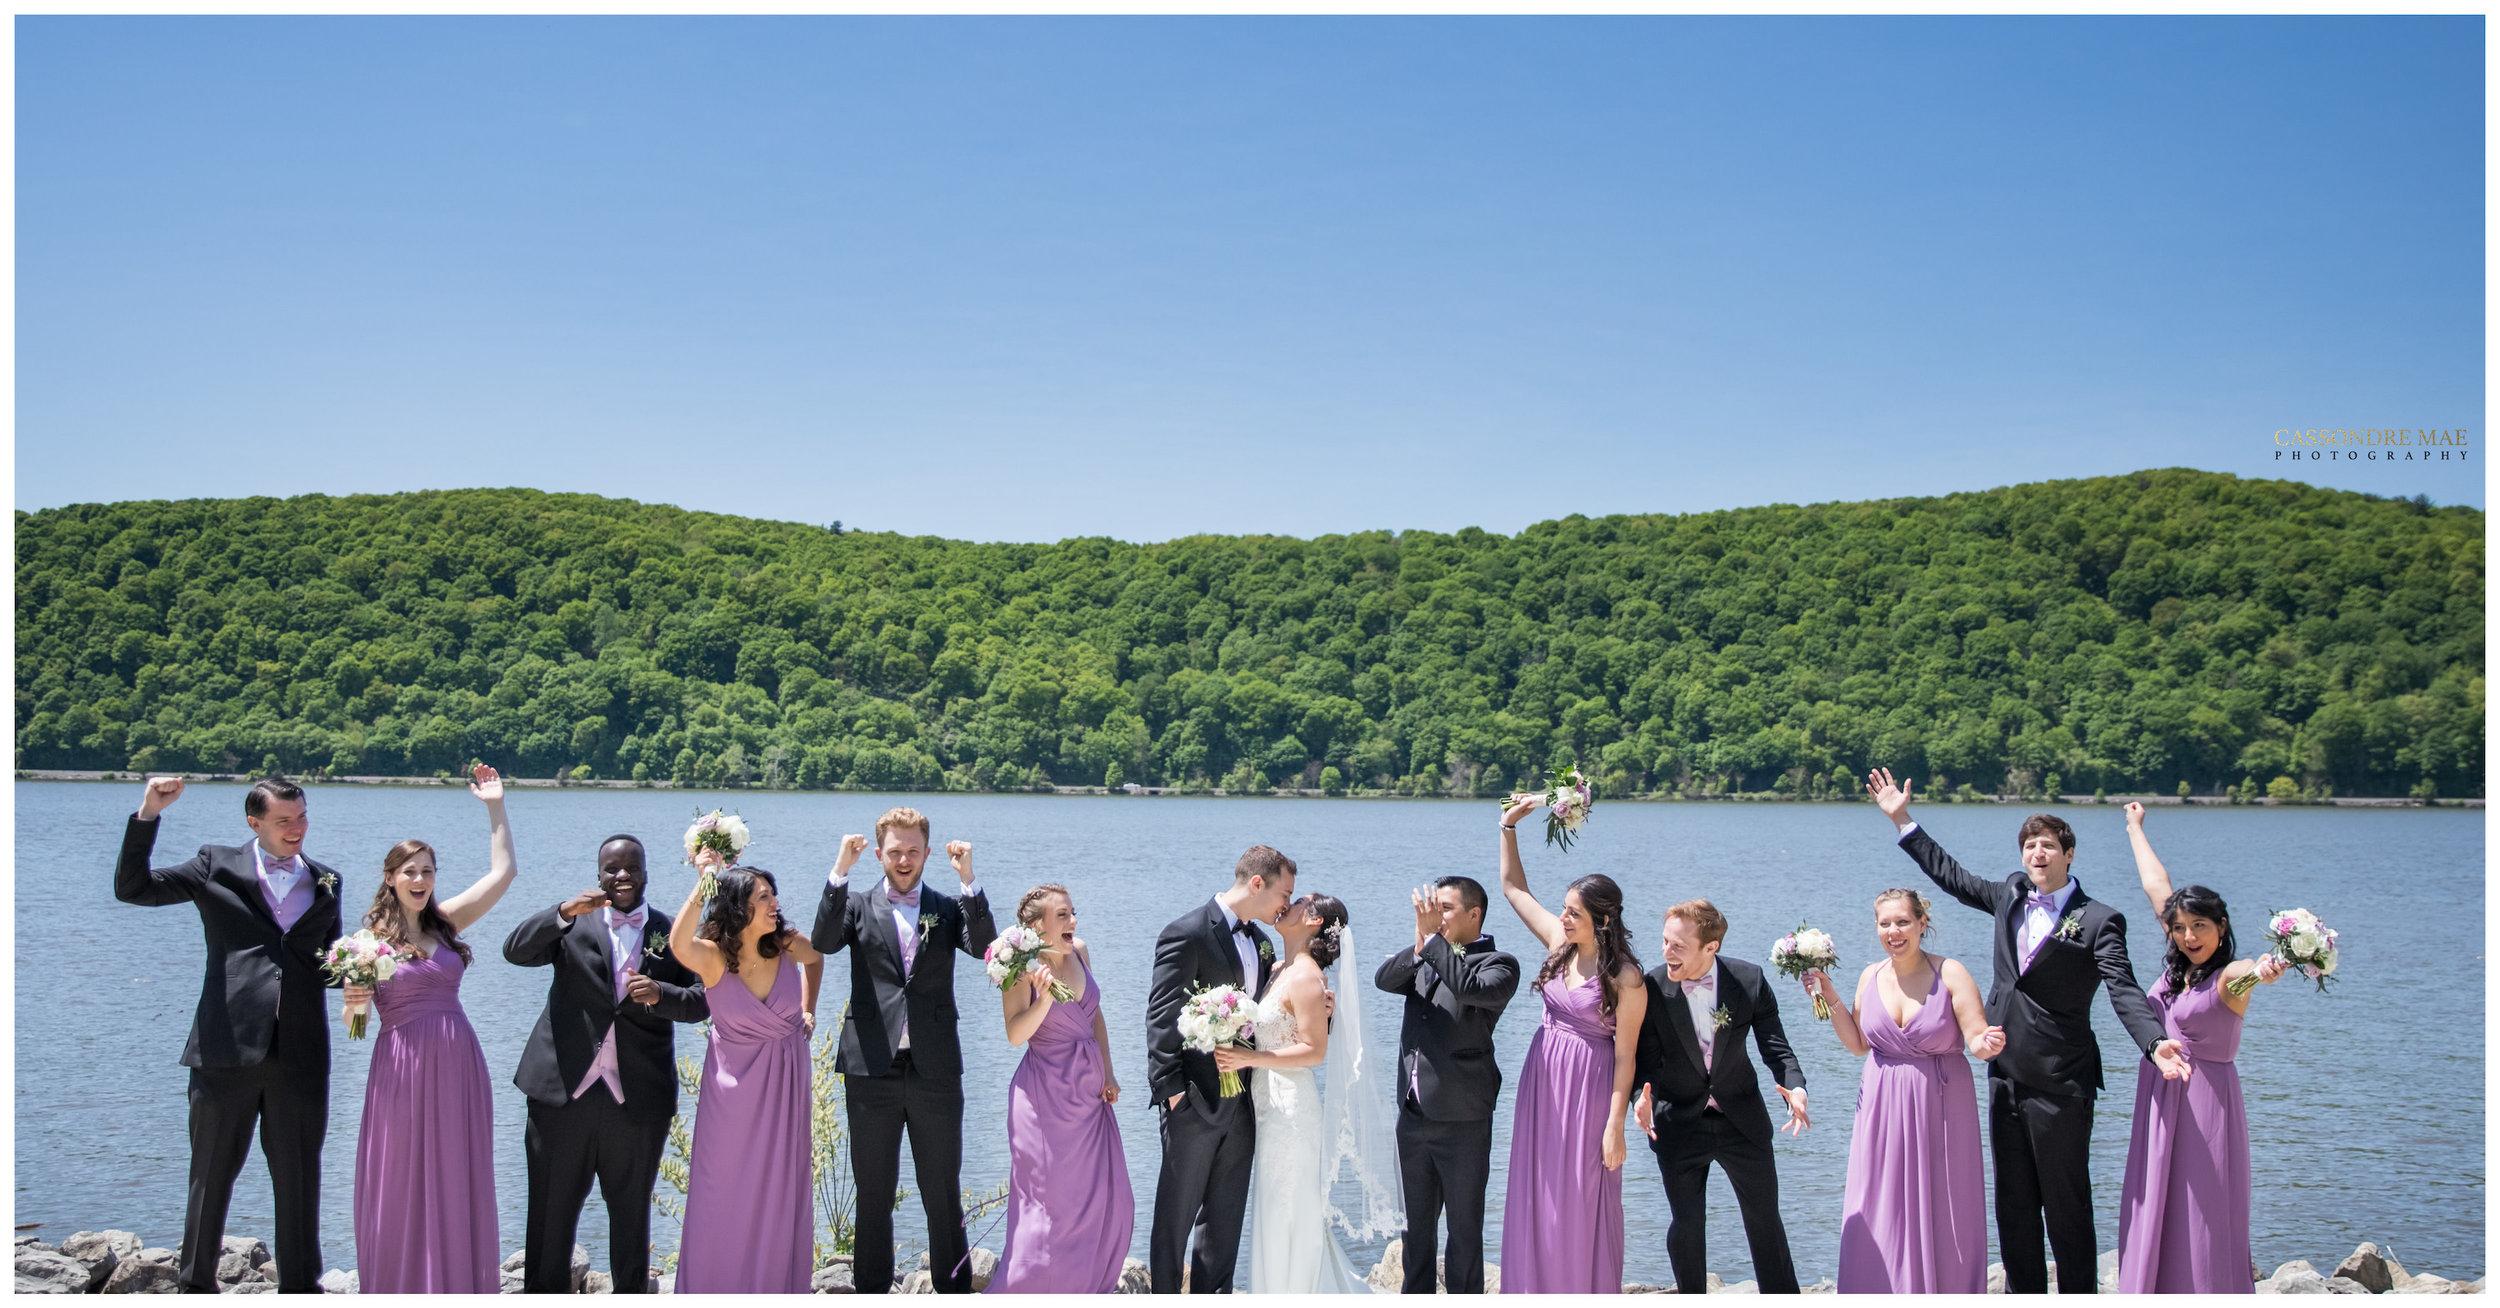 Cassondre Mae Photography The Grandview Poughkeepsie NY Wedding 16.jpg